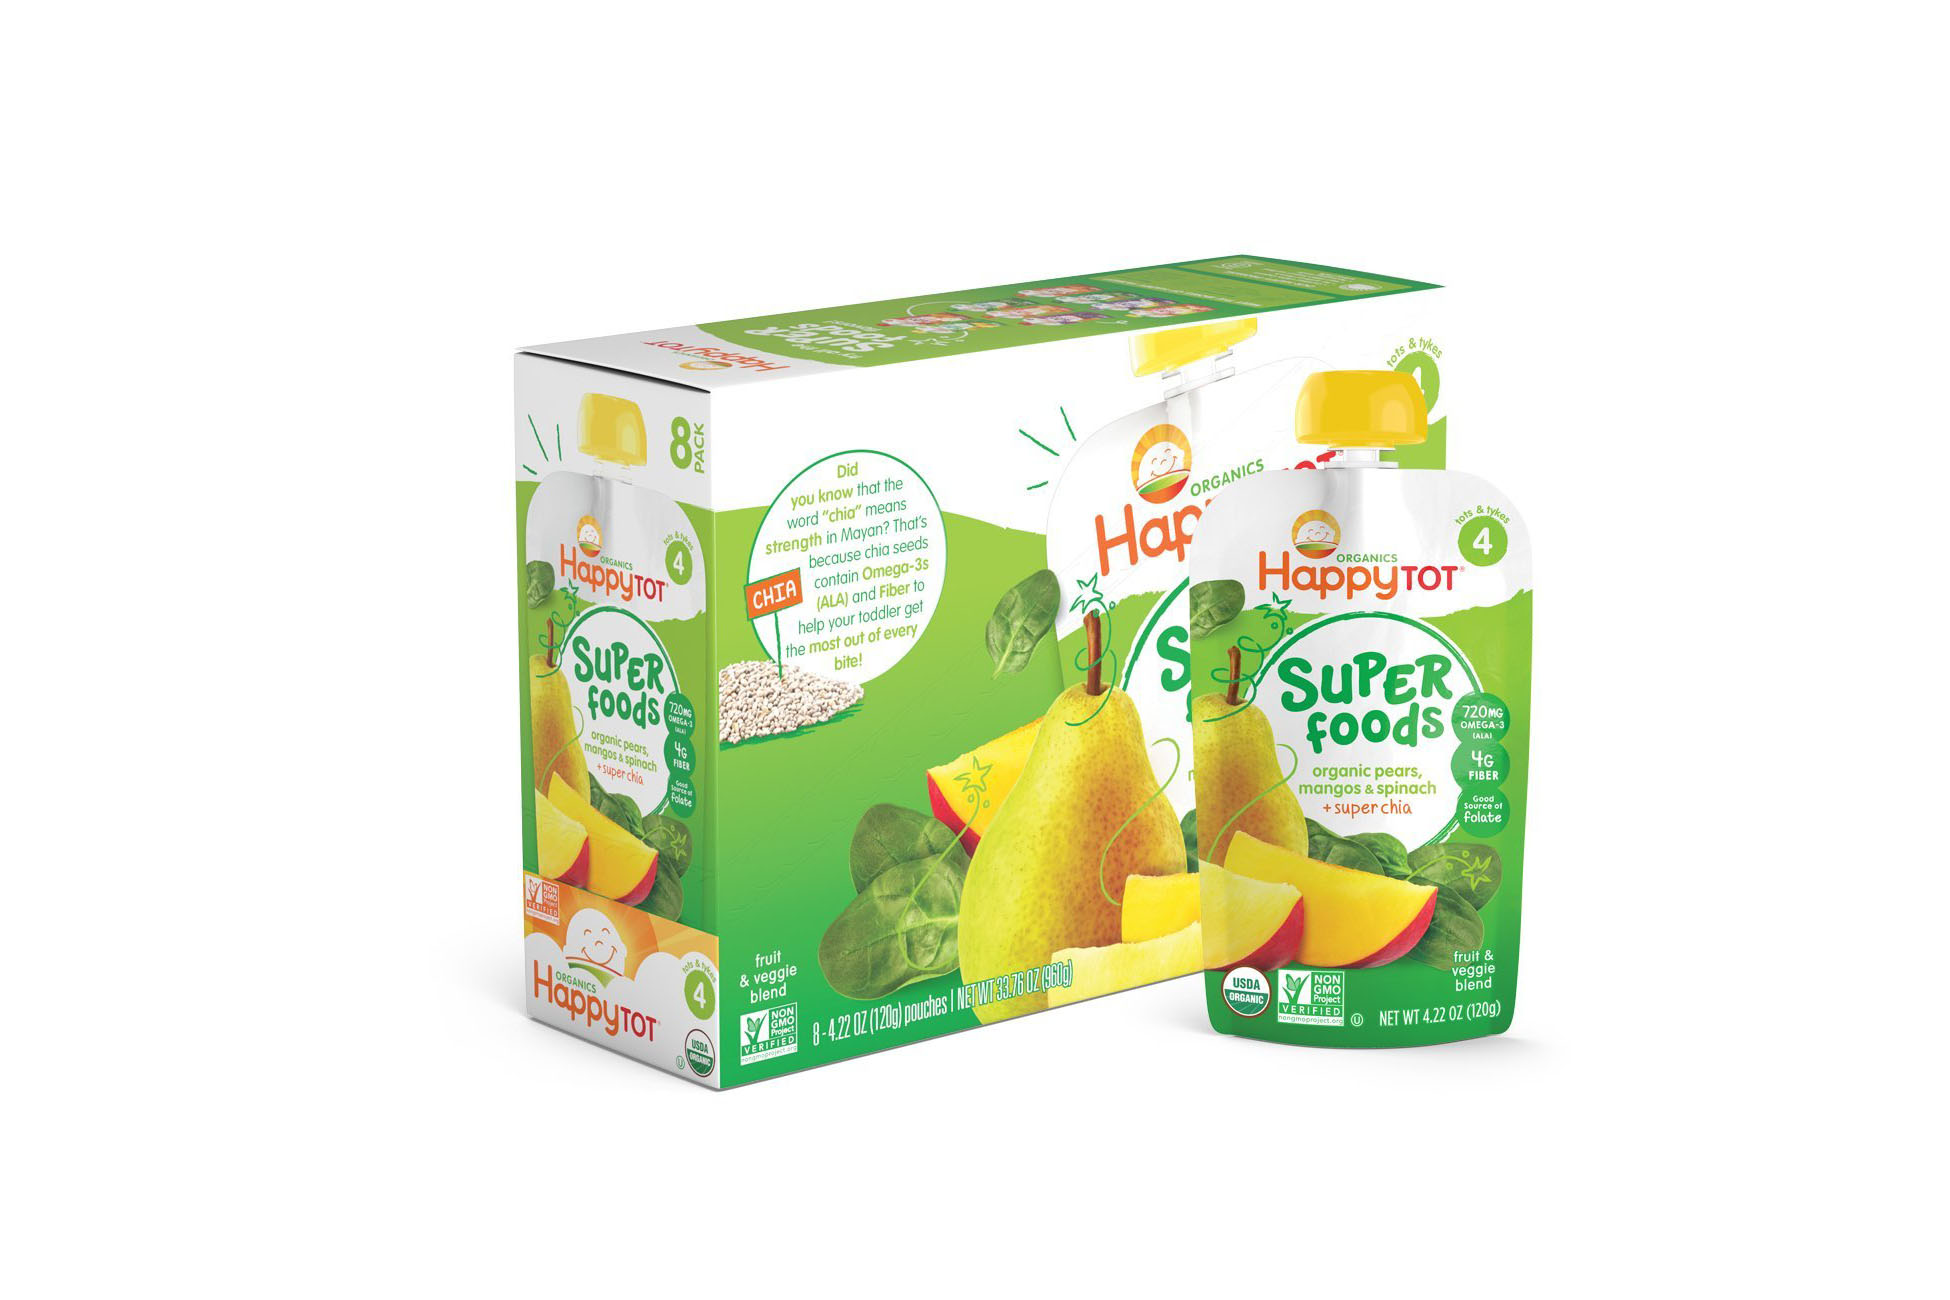 Organic Pears, Mango, Spinach Baby Food - 4.5 stars - $20 (Prime)